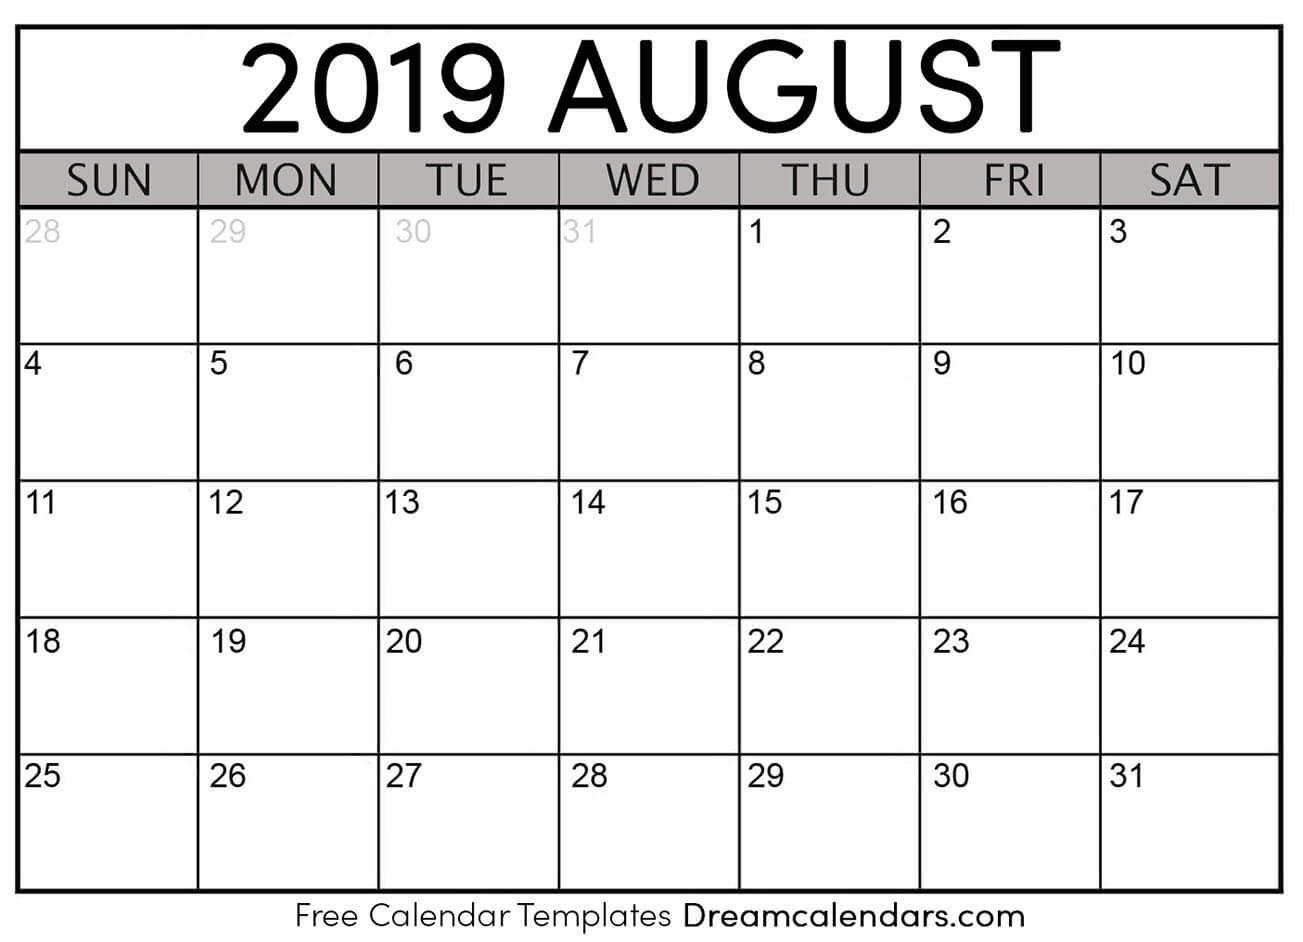 Printable August 2019 Calendar Calendar 2019 August